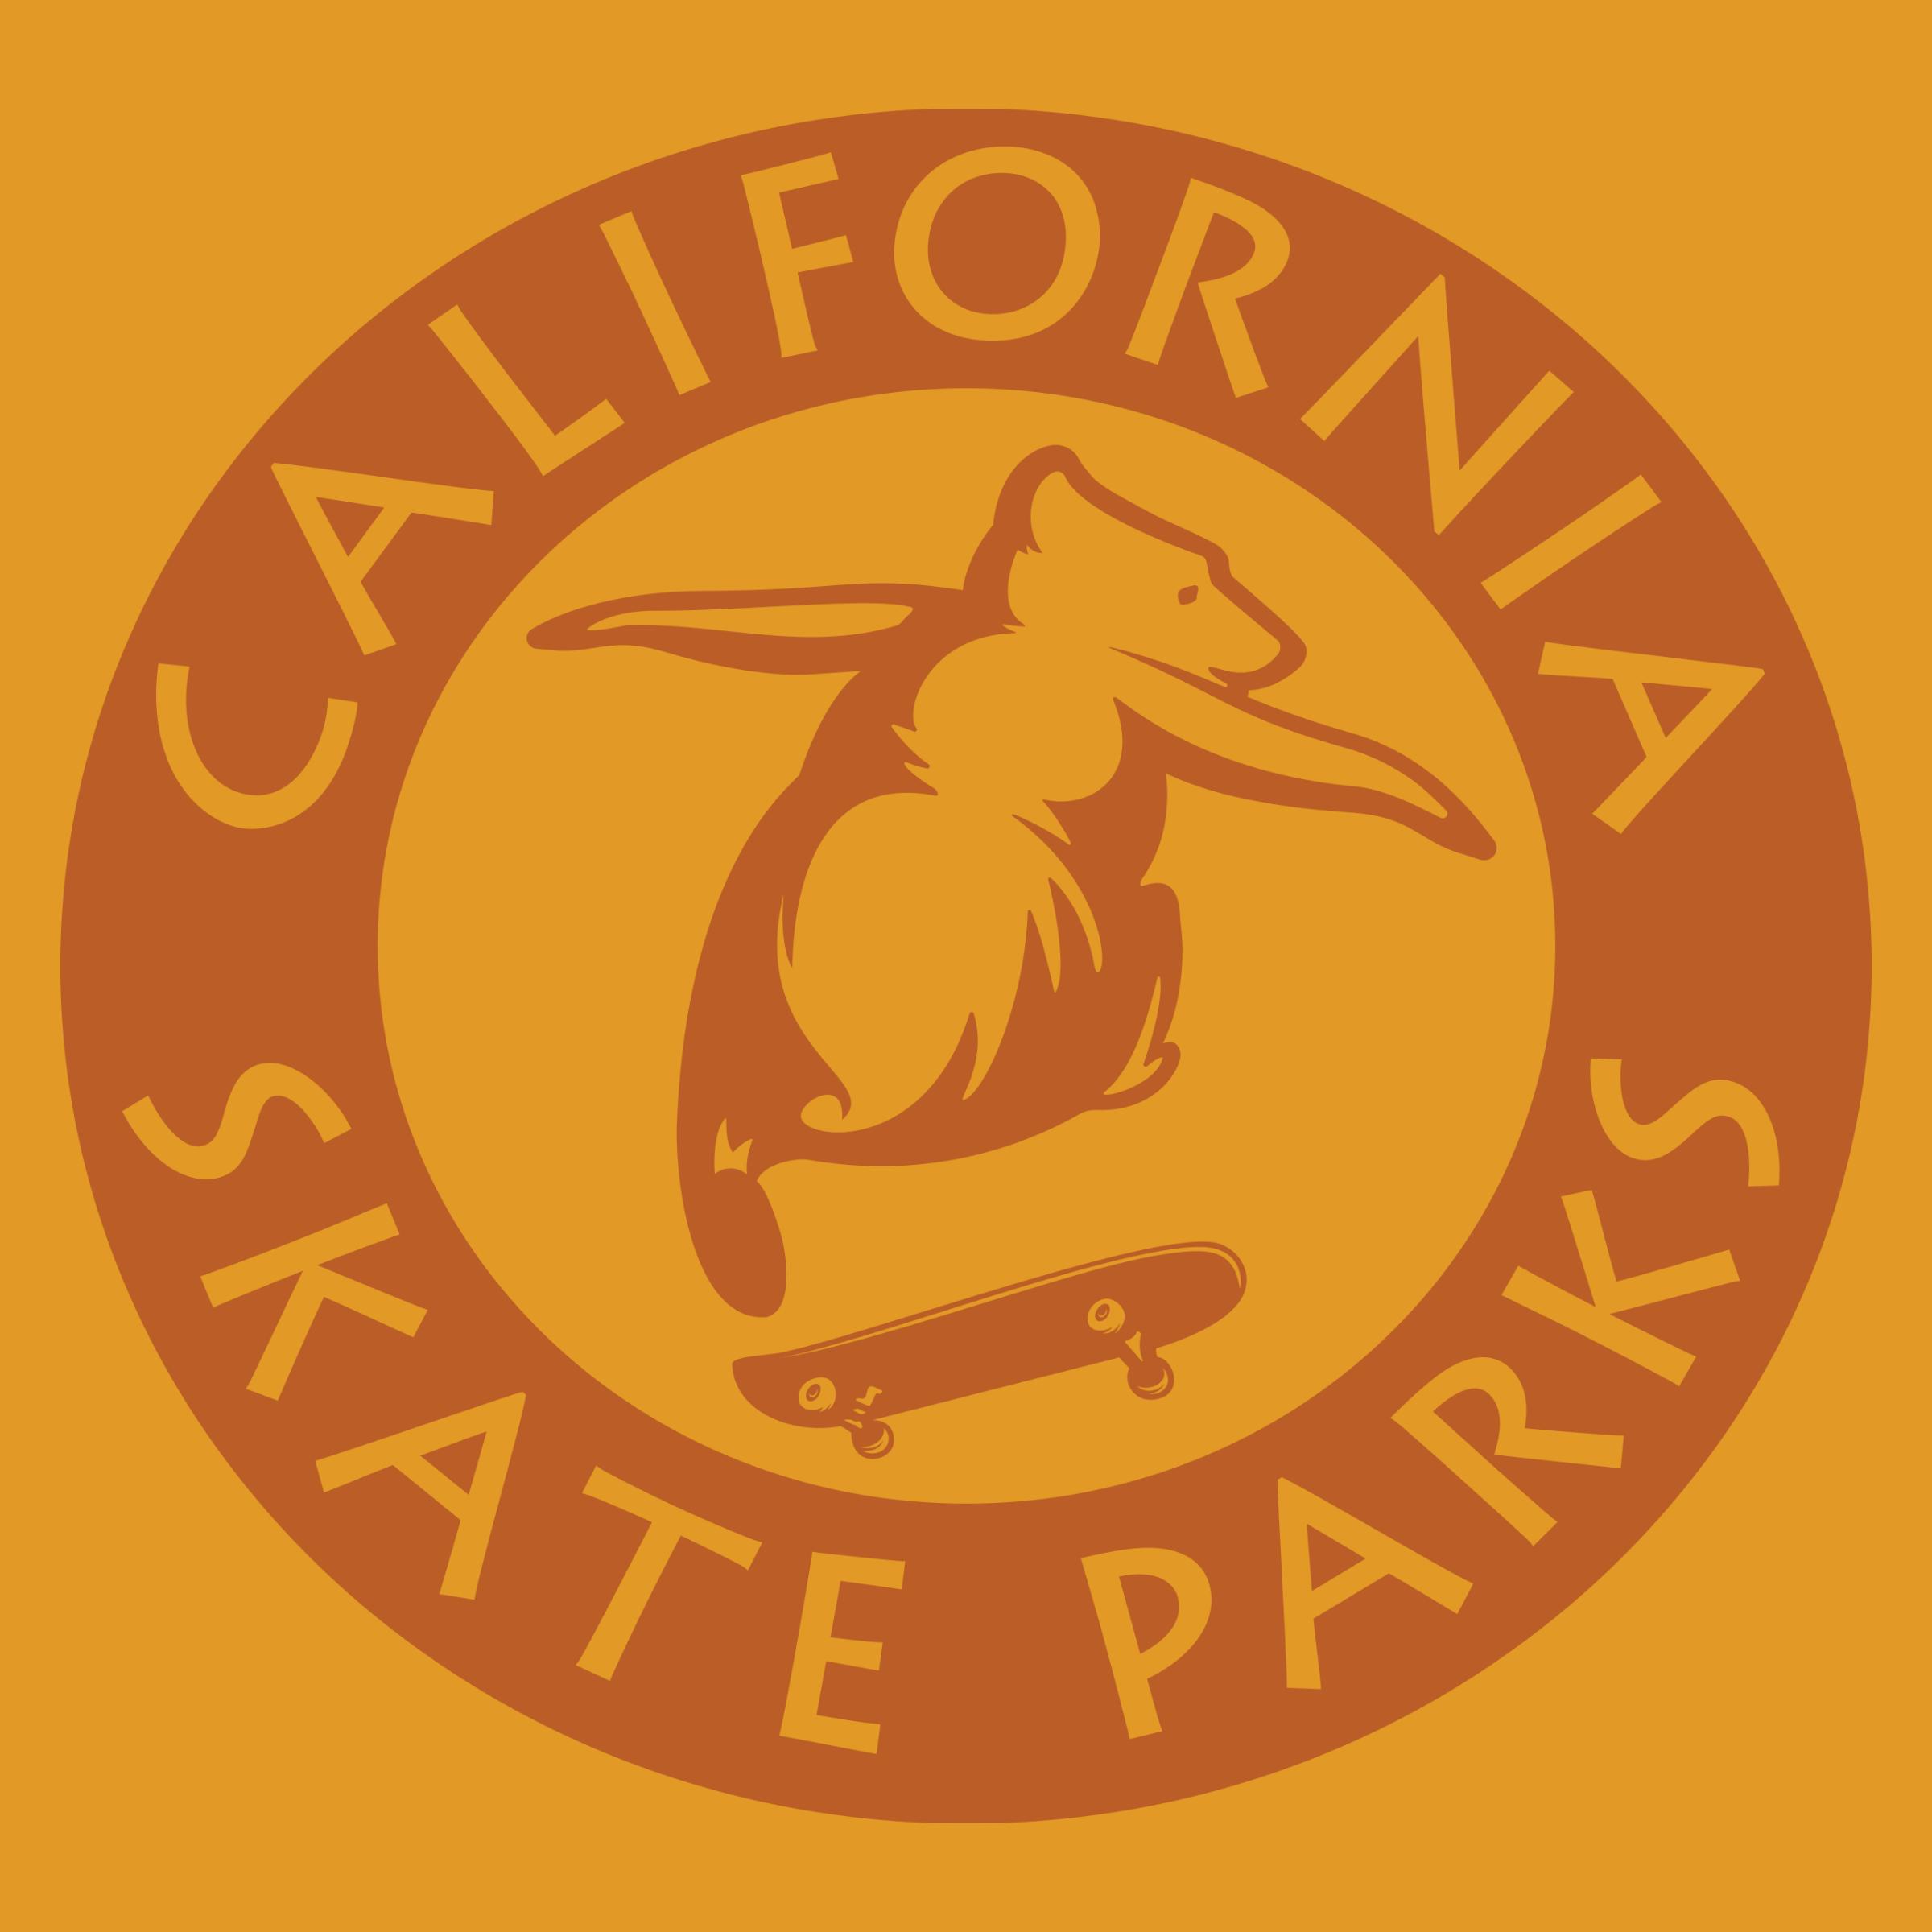 California Skate Parks Detail